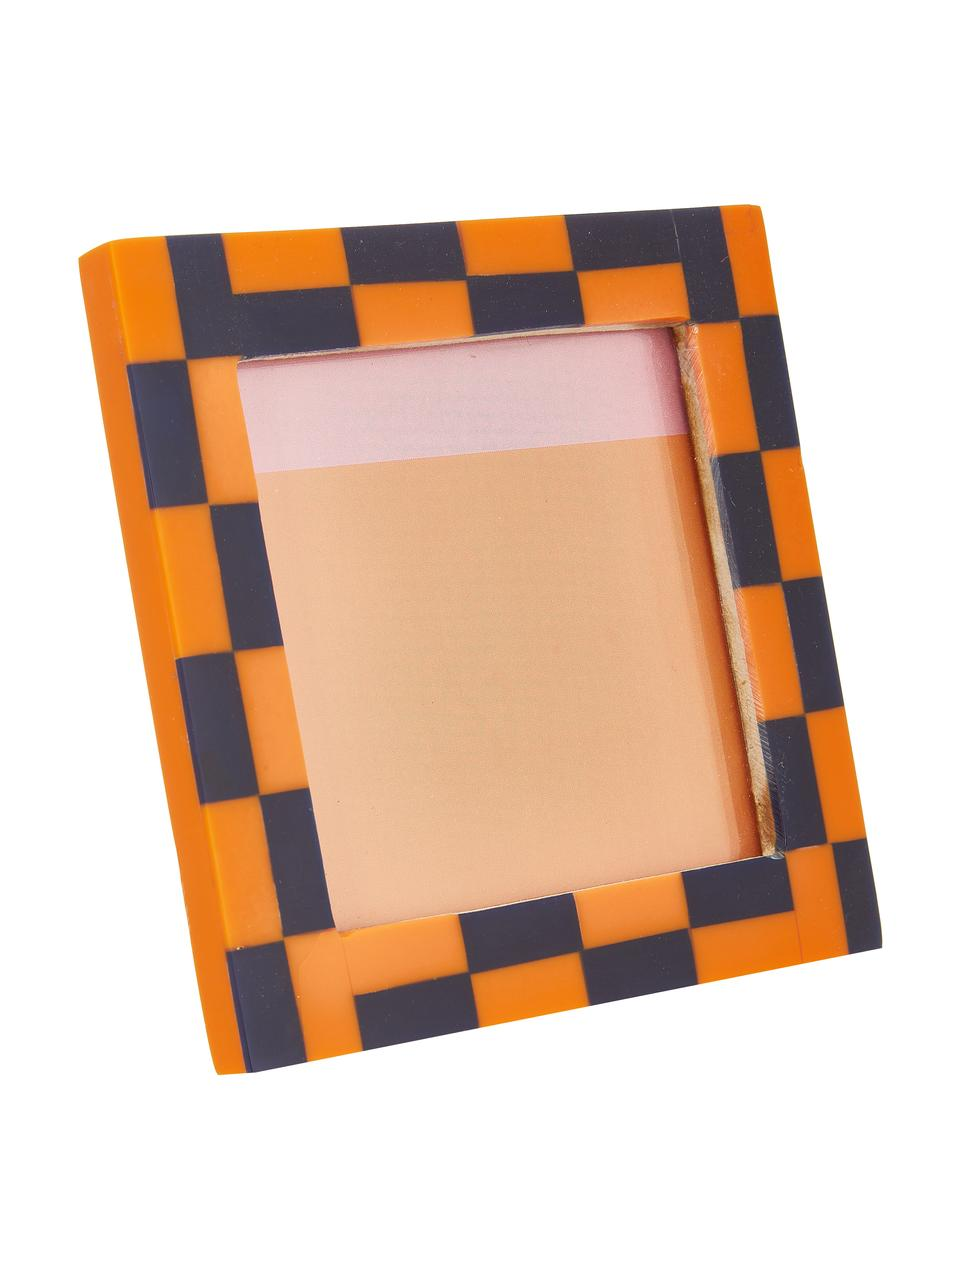 Bilderrahmen Check, Kunststoff, Orange, Blau, 10 x 10 cm